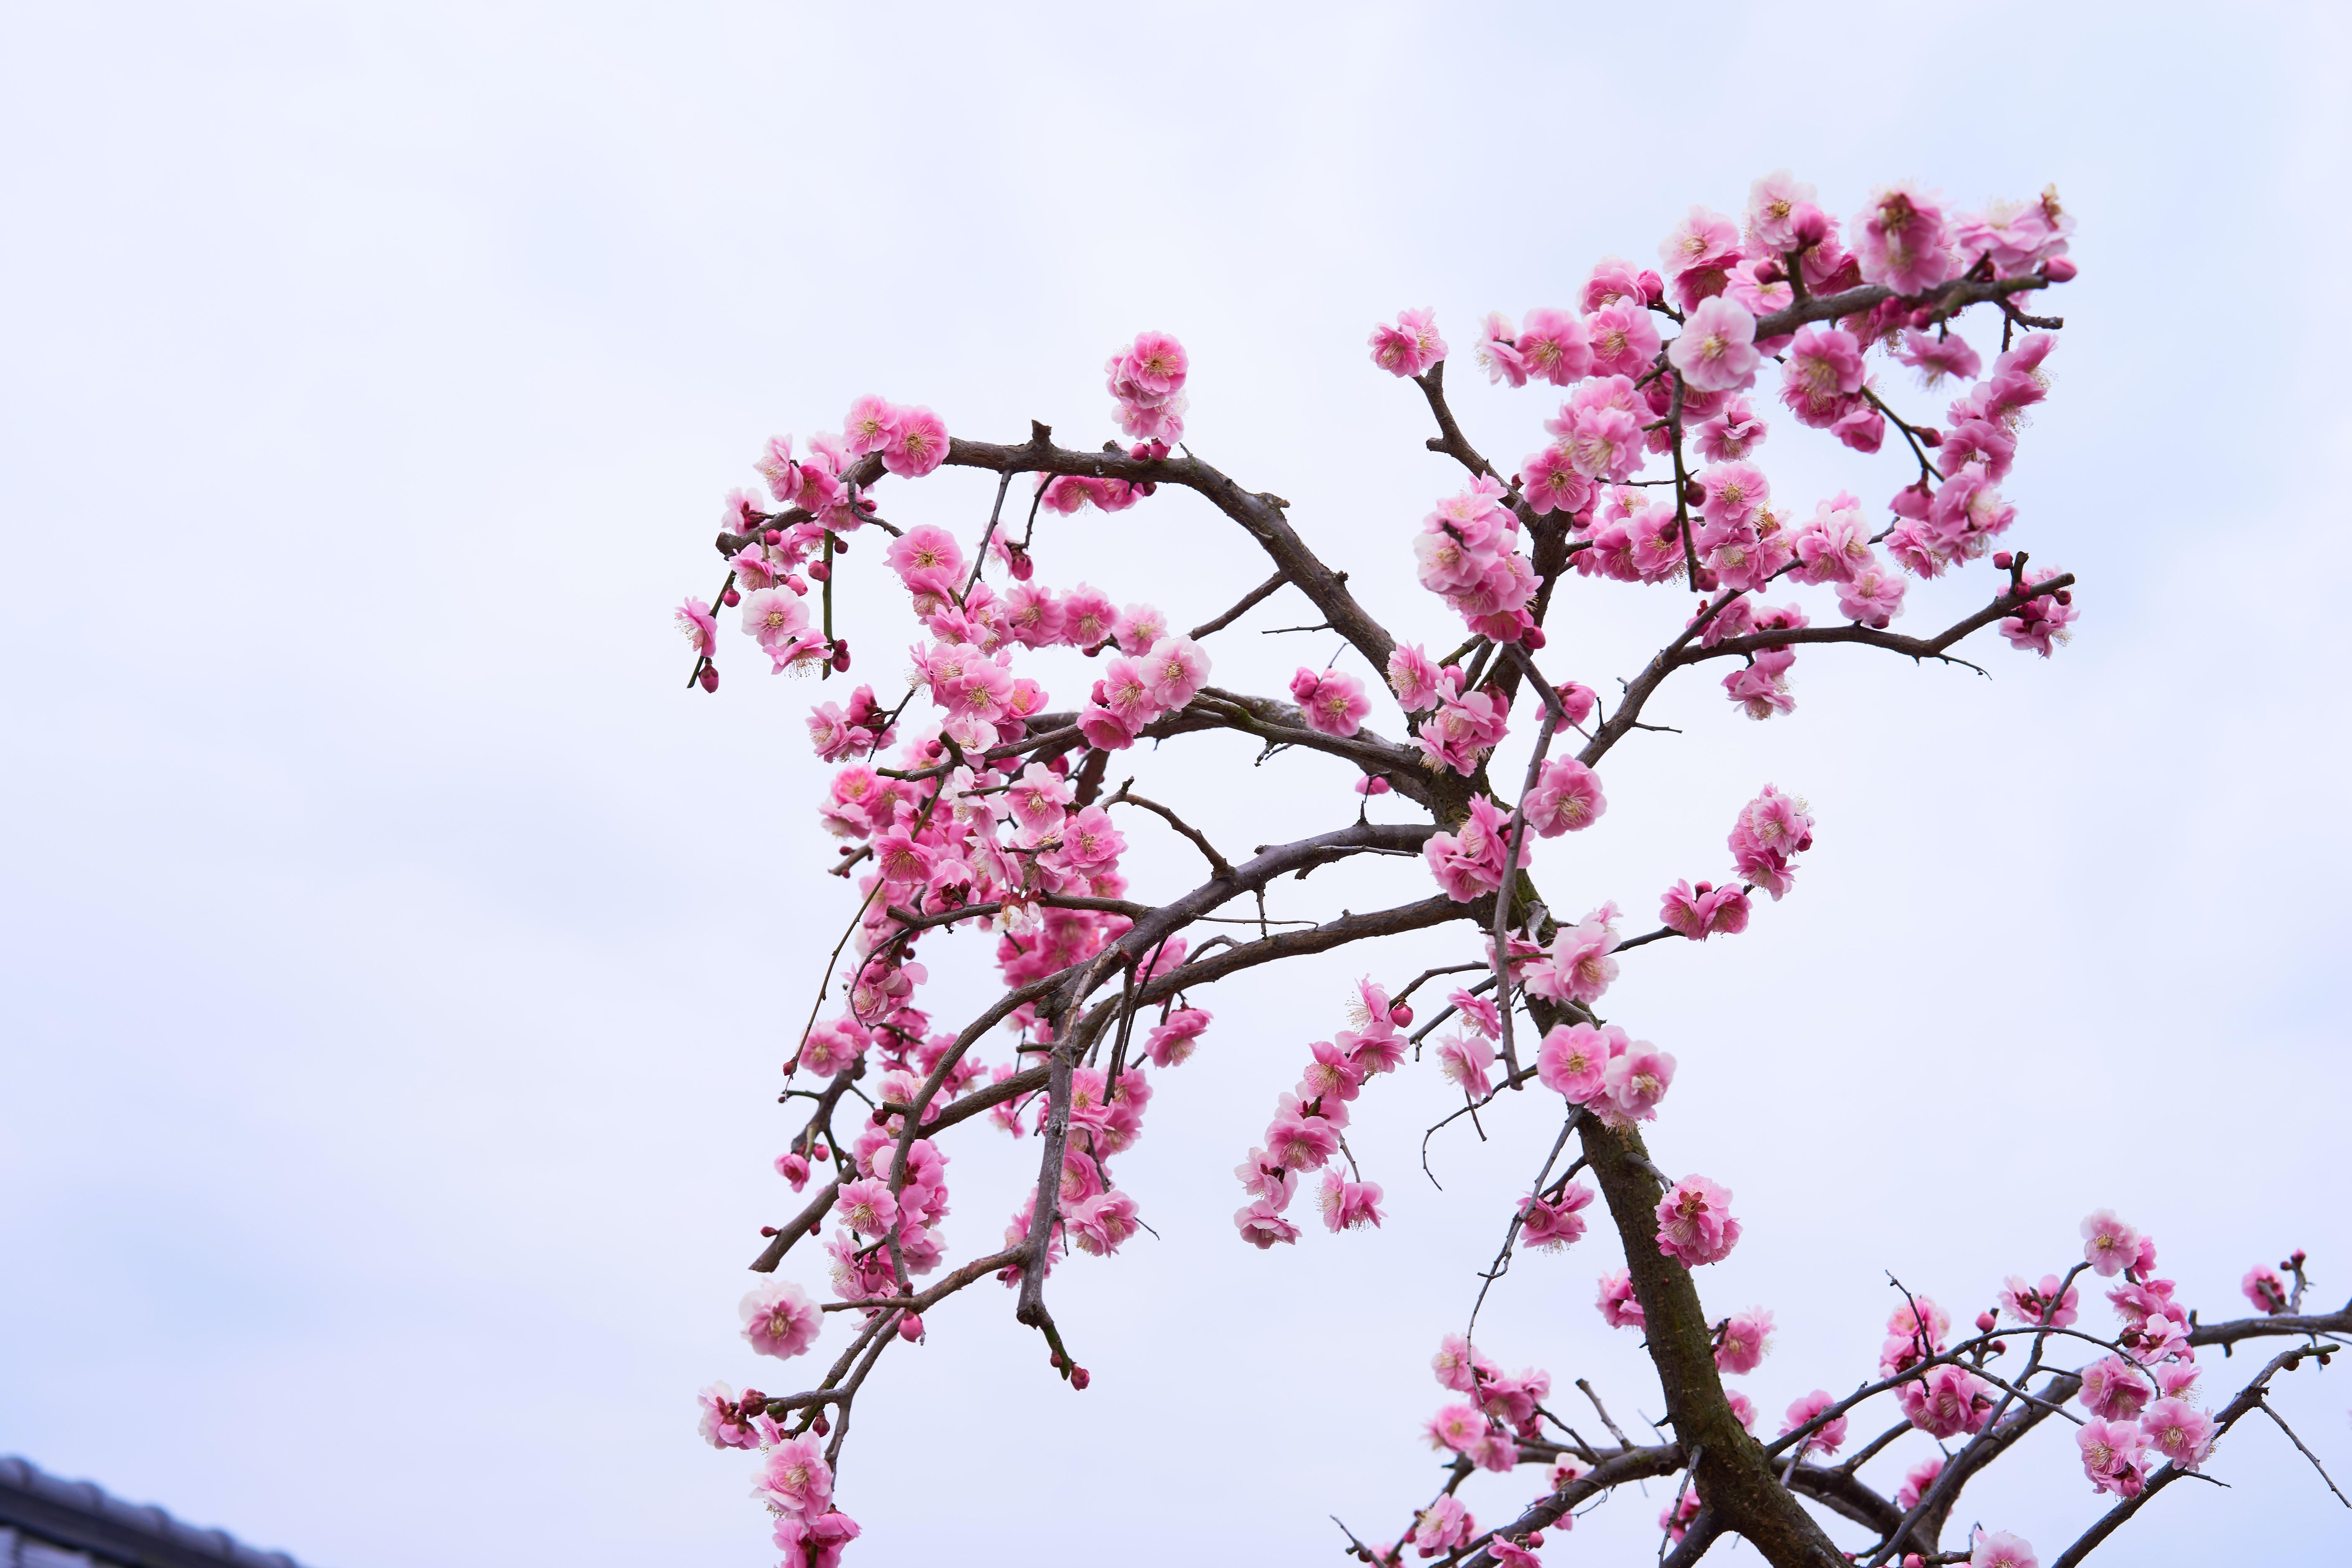 pink cherry blossom at daytime